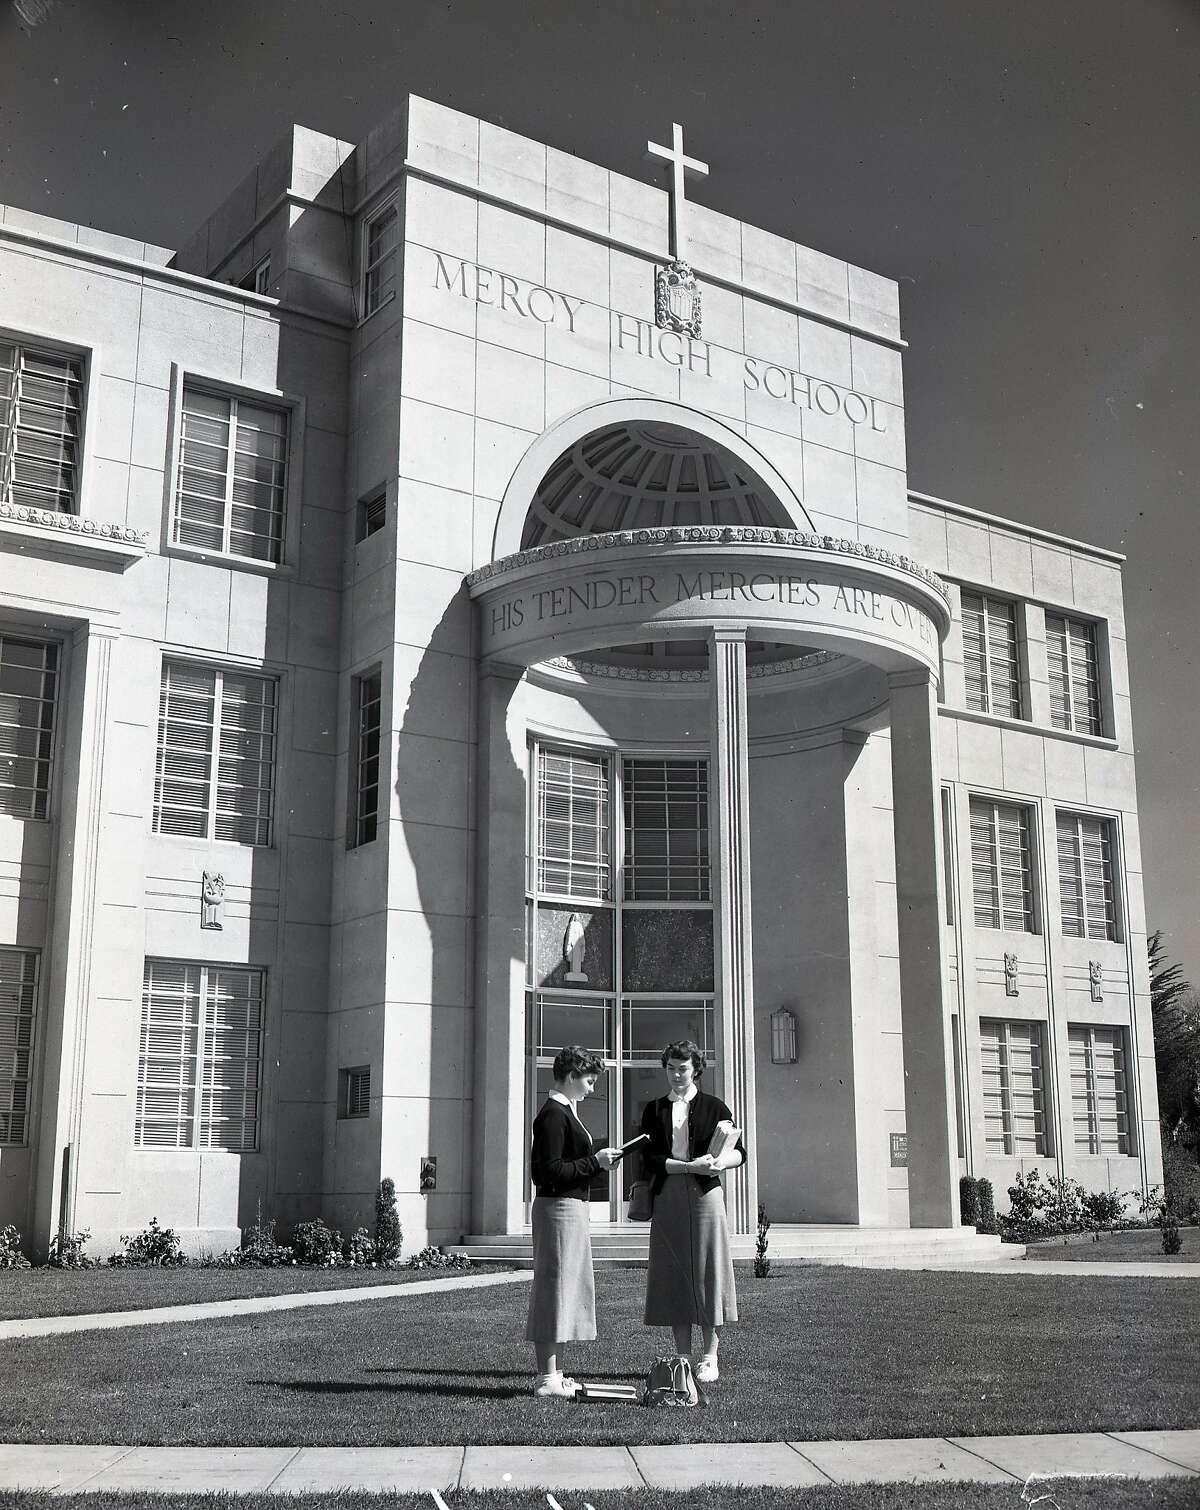 Mercy High School , April 3, 1955